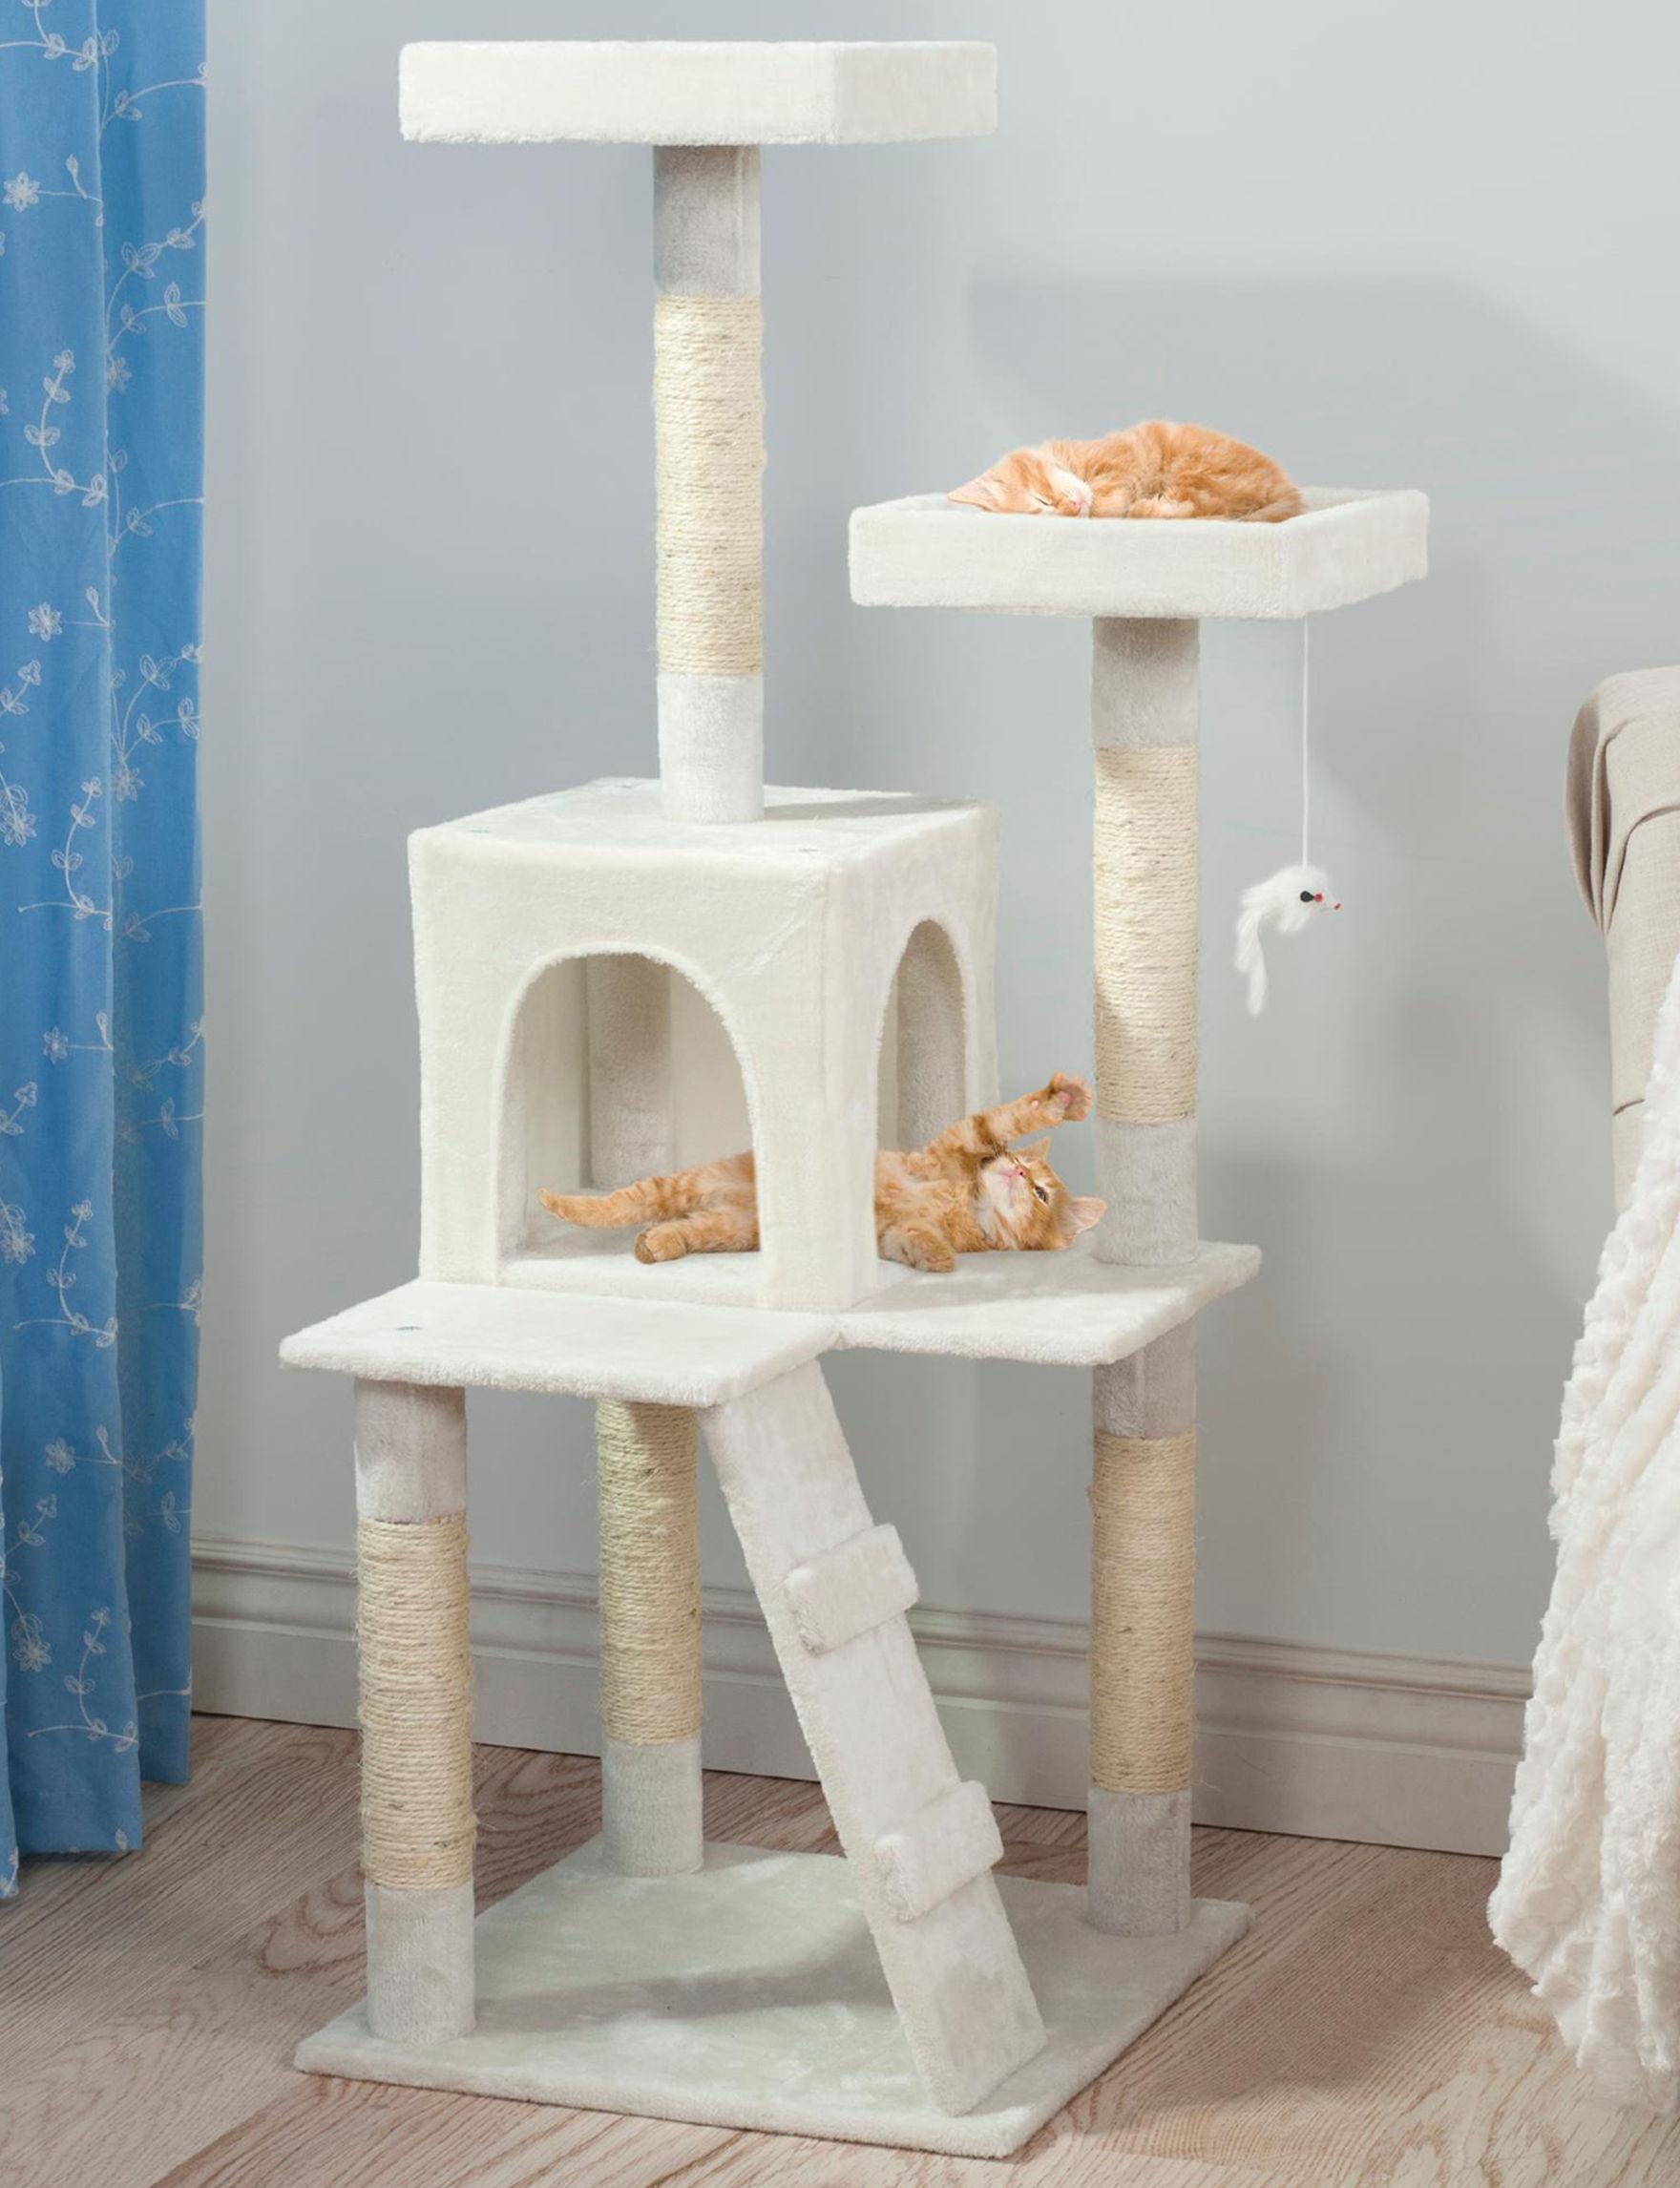 Petmaker White Pet Beds & Houses